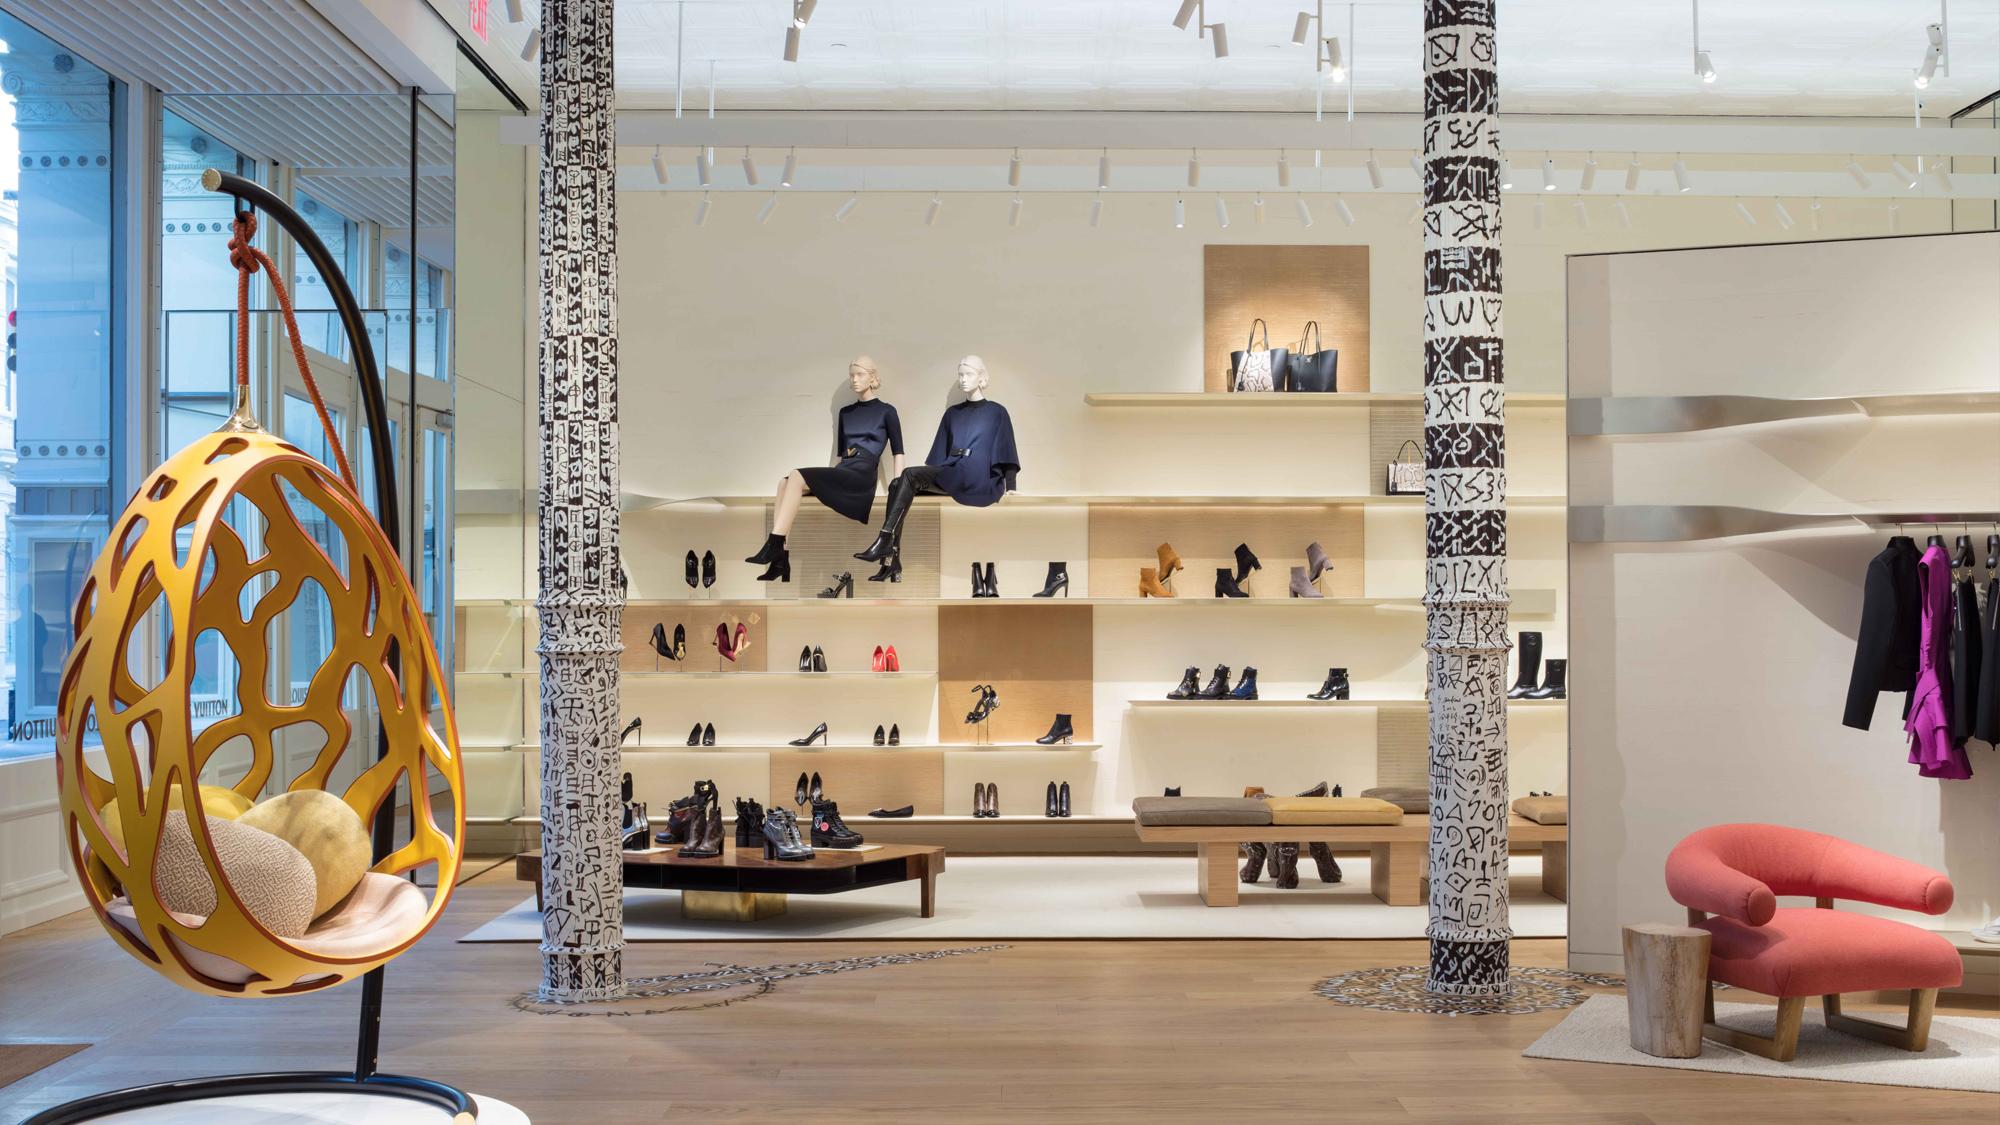 Louis Vuitton New York SoHo image 1